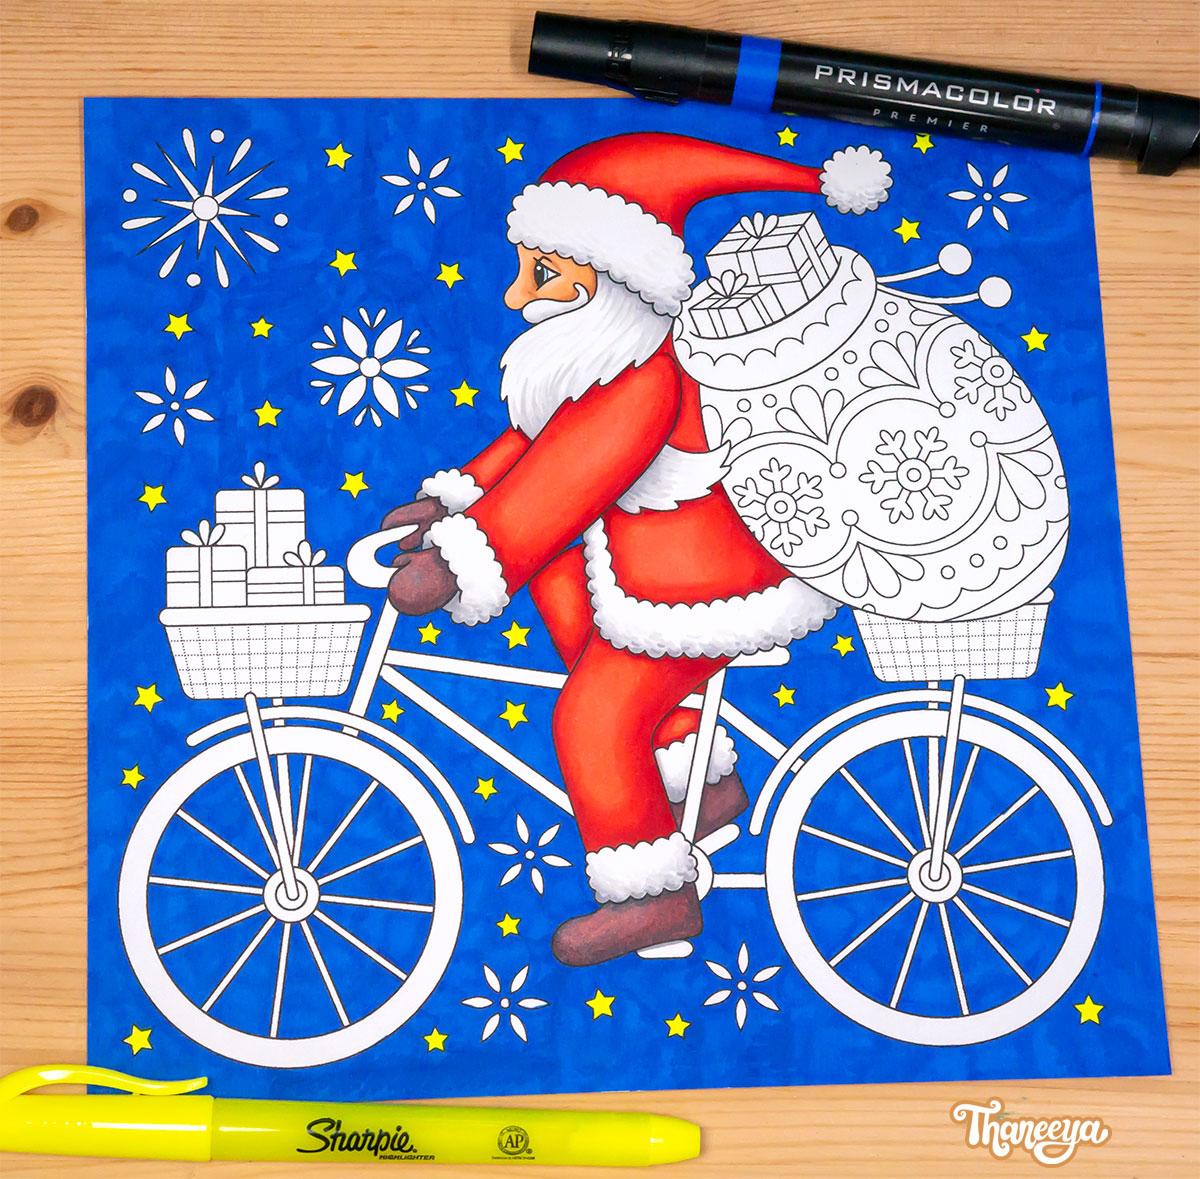 Santa riding a bicycle coloring page from Thaneeya McArdle's Holiday Cheer Coloring Book